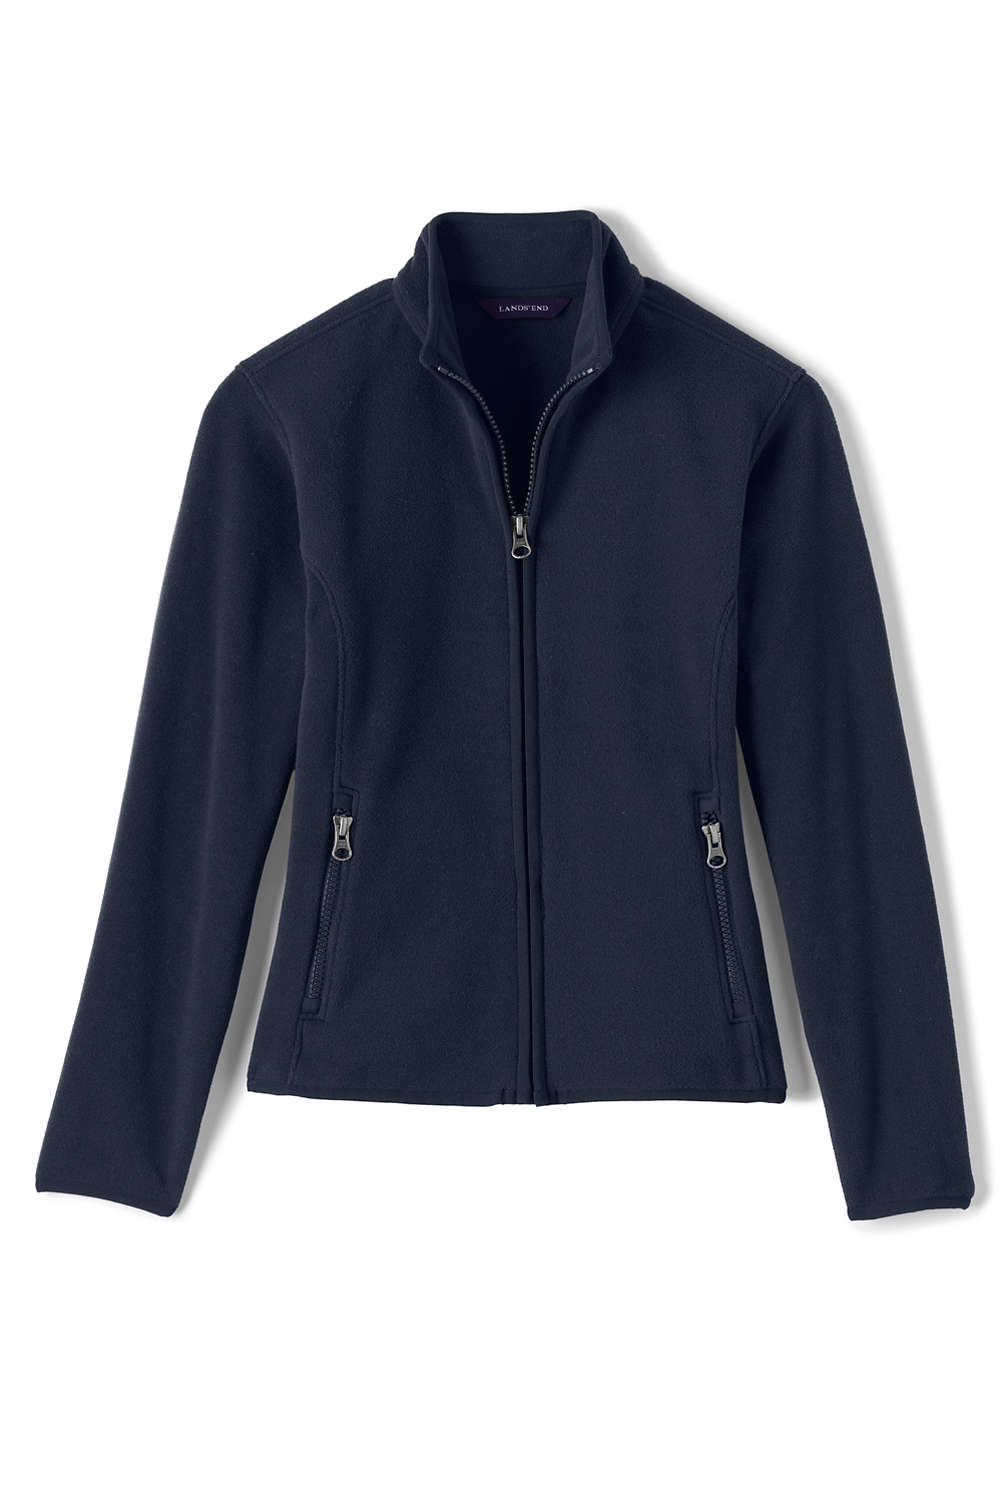 f1a6e3f63 School Uniform Girls Fleece Jacket from Lands  End